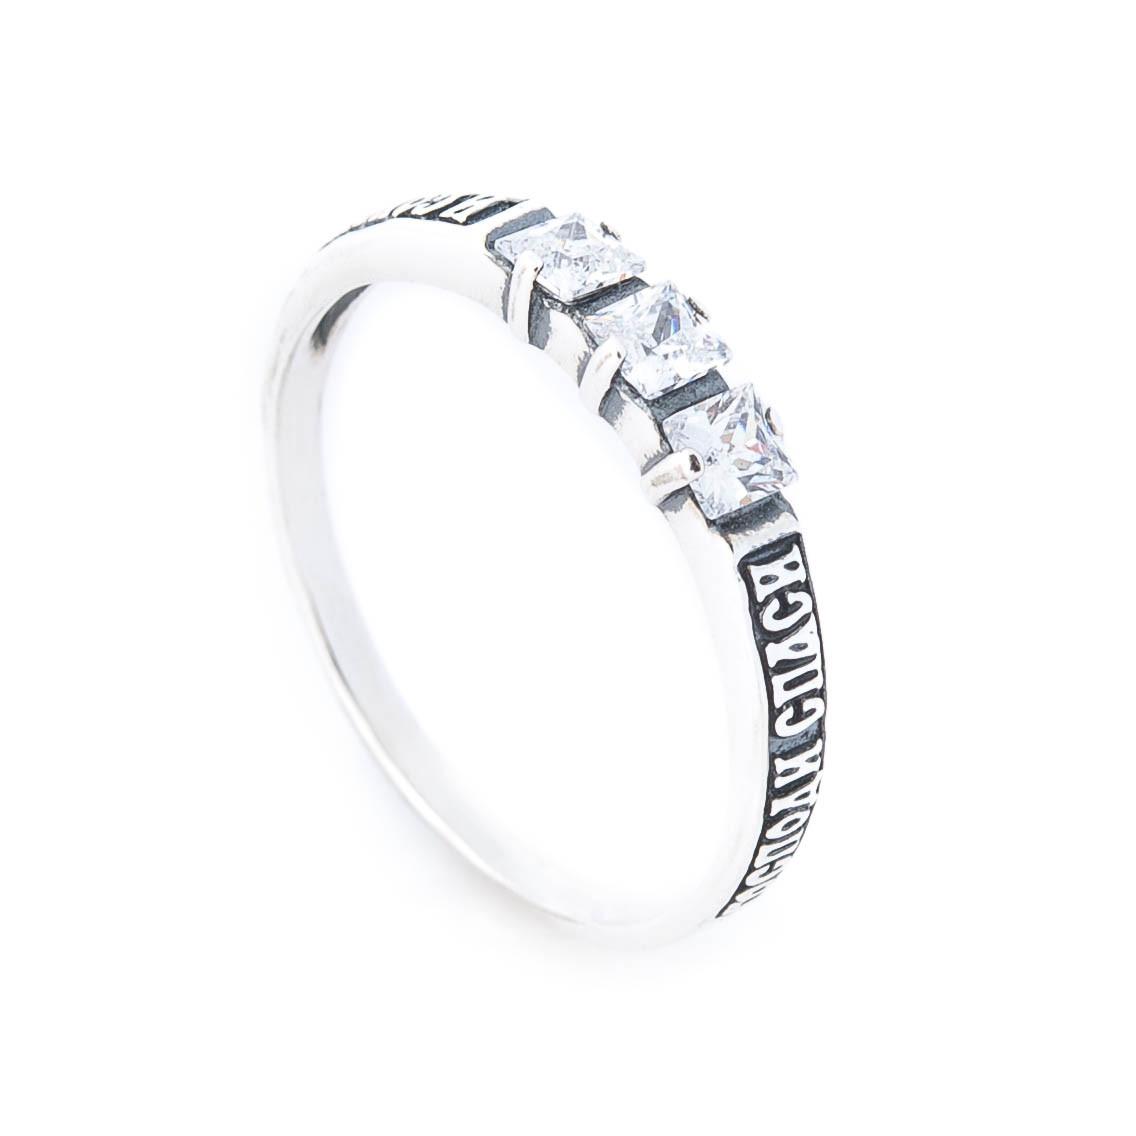 b0fbb7a596a5 Женское серебряное кольцо